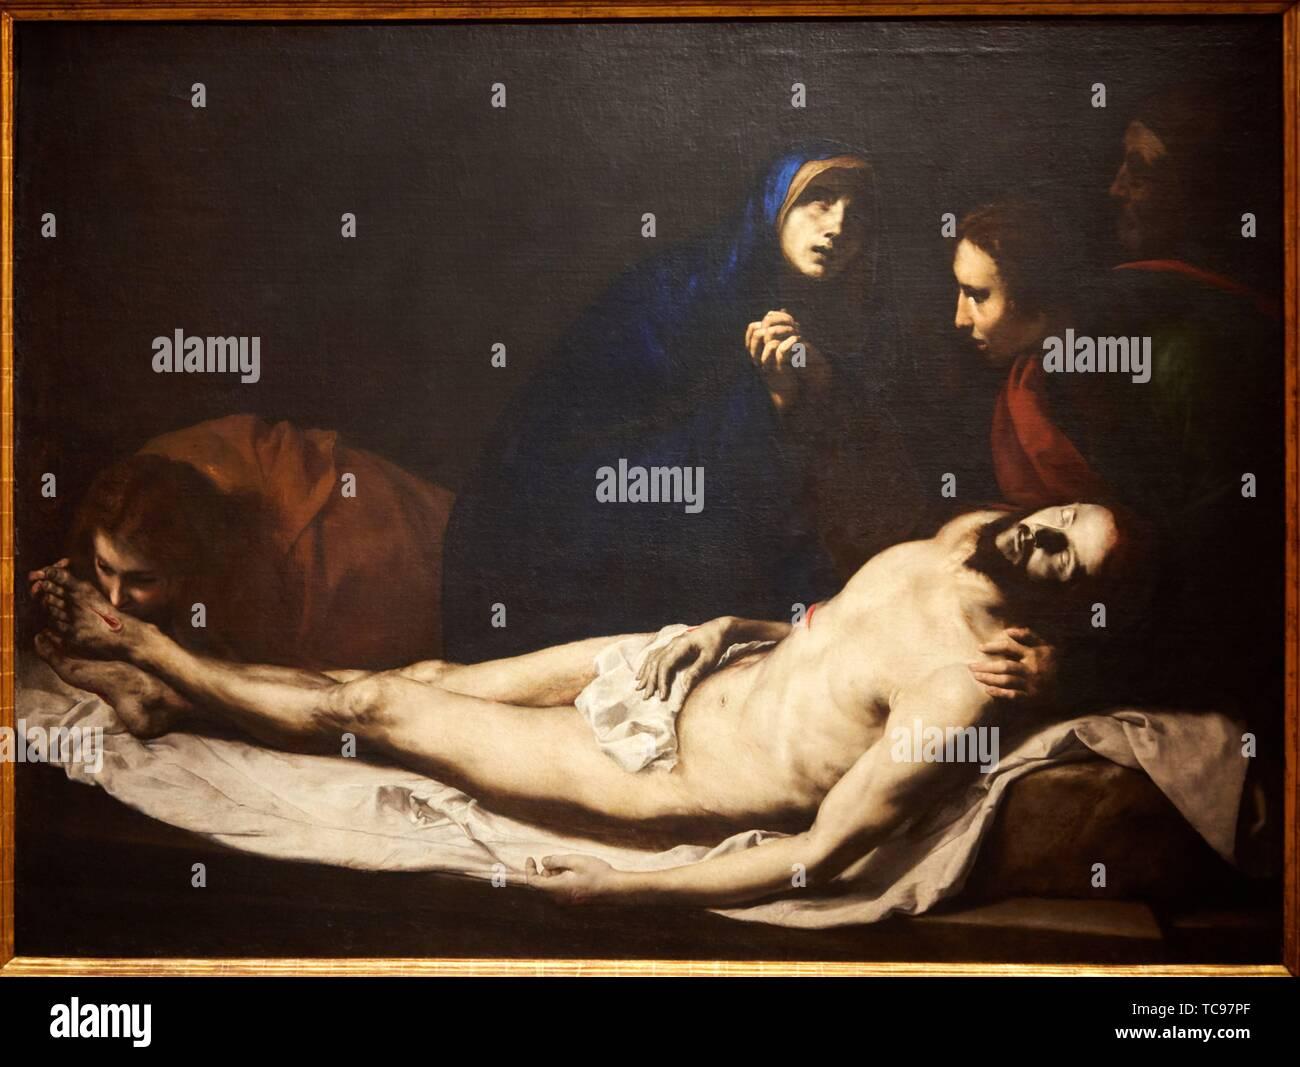 '''The Pietá'', 1633, José de Ribera, Thyssen Bornemisza Museum, Madrid, Spain, Europe - Stock Image